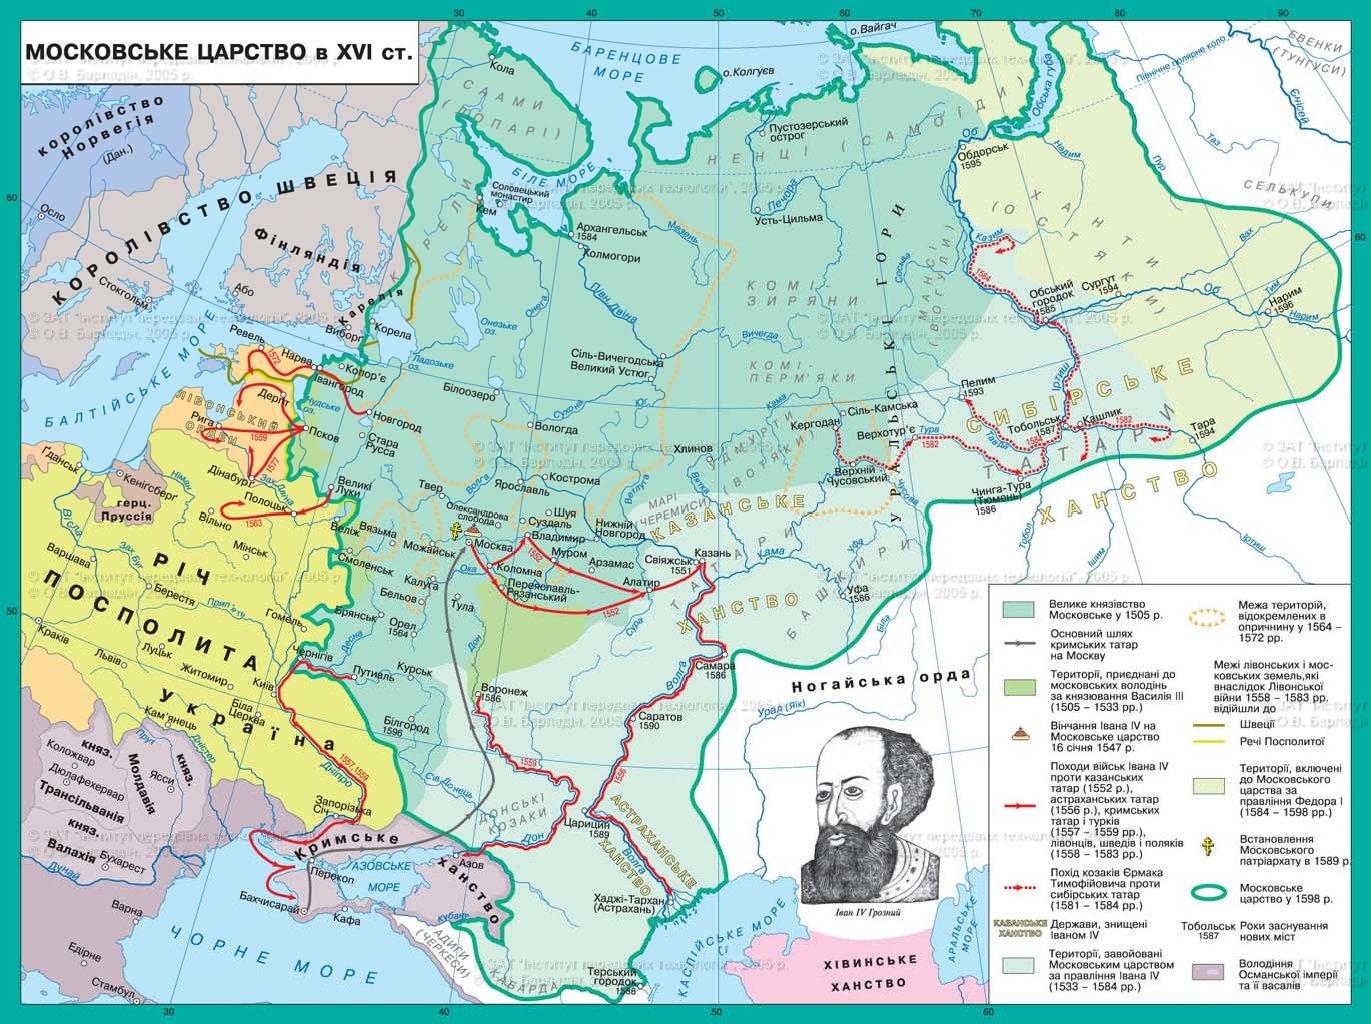 http://ukrmap.su/program2009/wh8/Maps/b_8.jpg